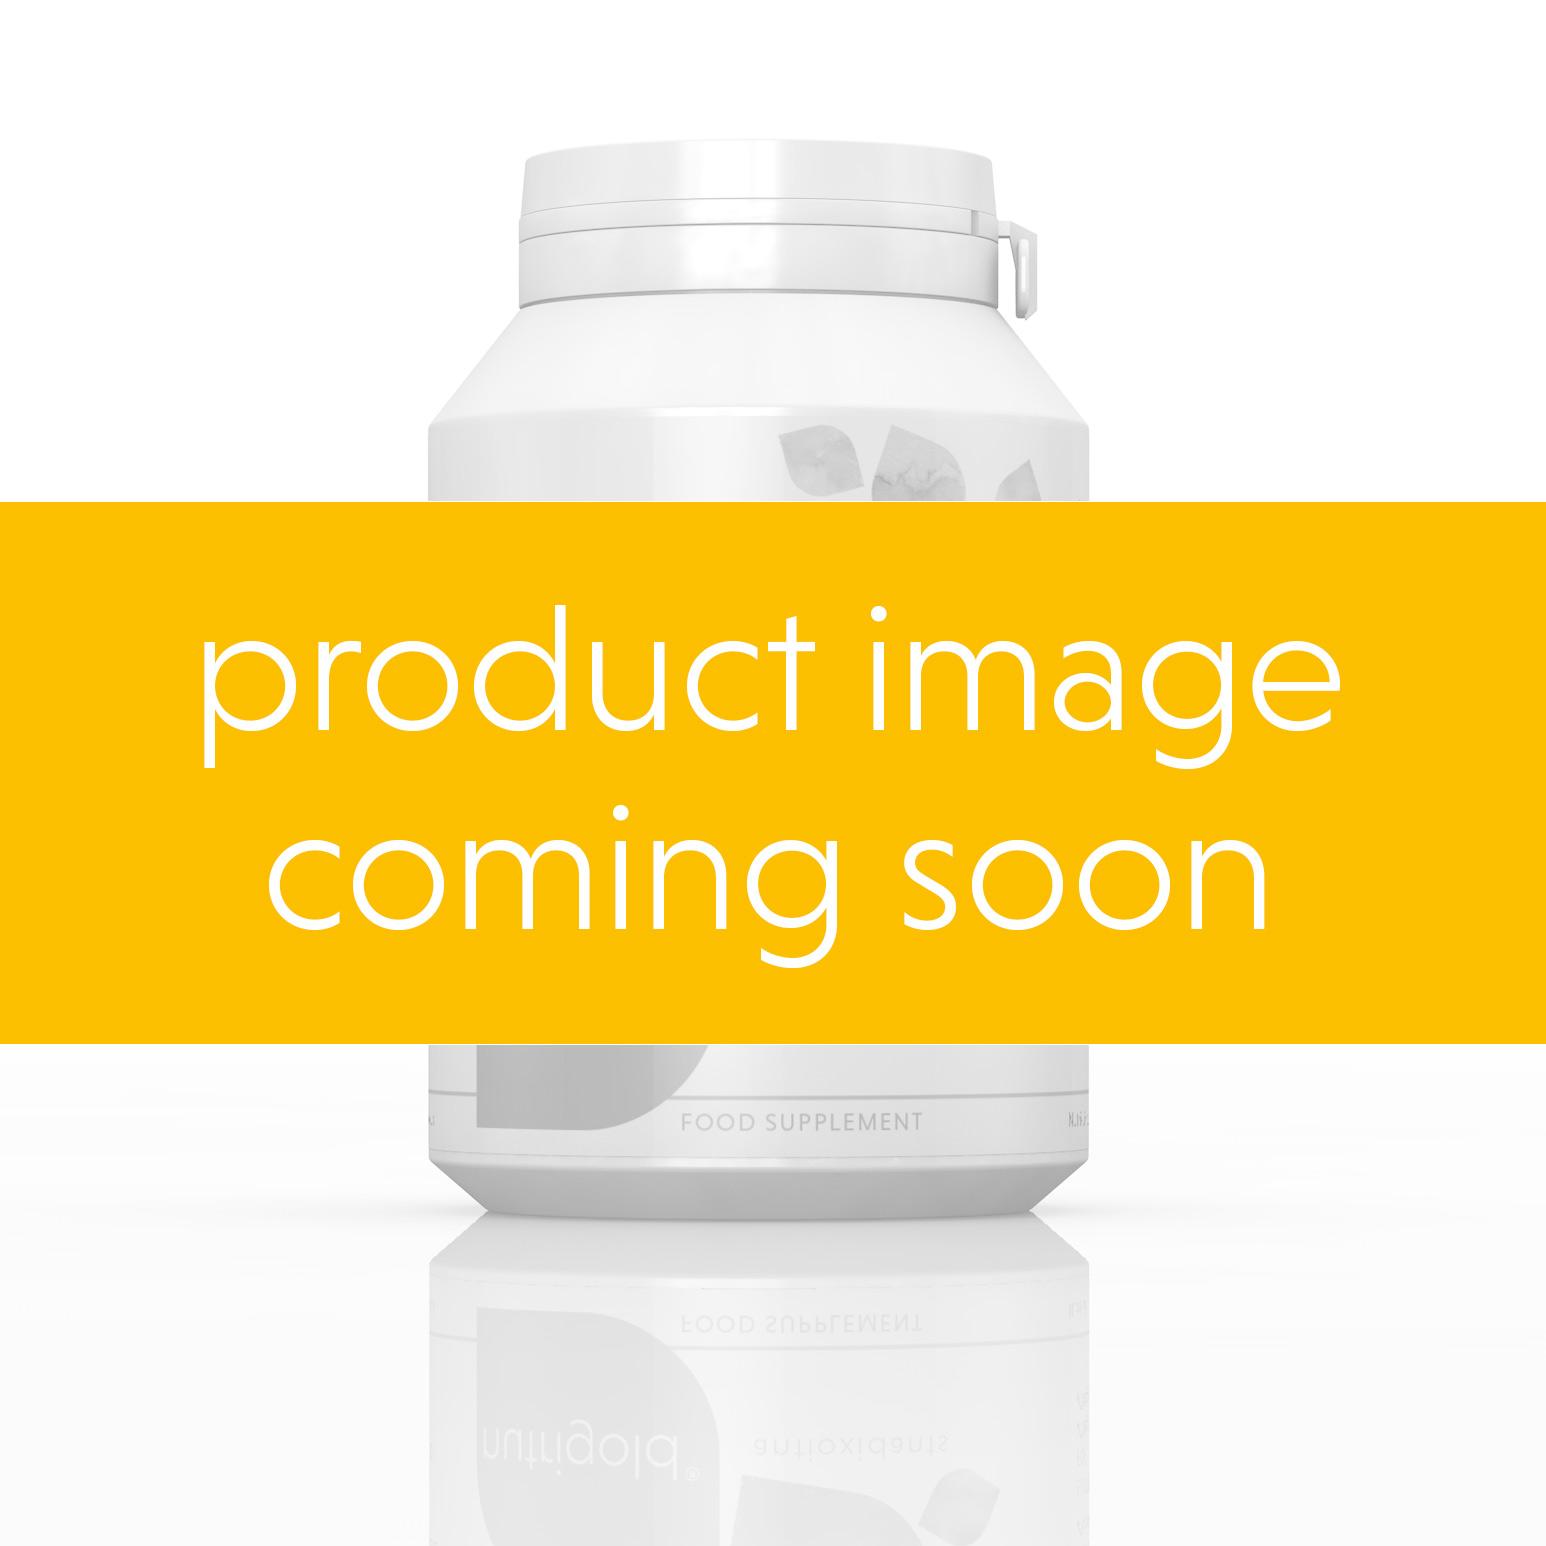 WEBINAR: Vitamin C - 10th September 2019 @ 12pm